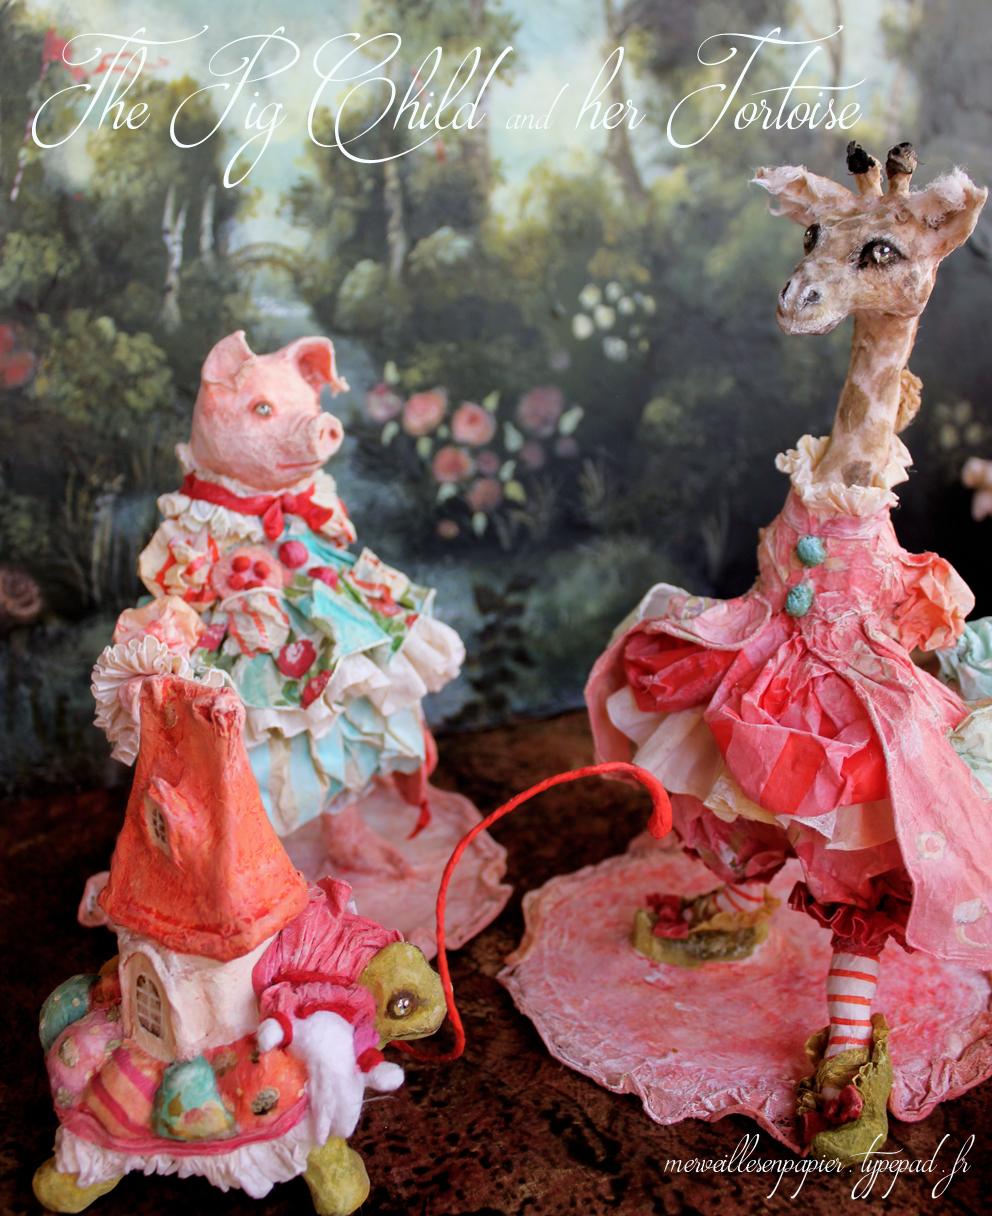 enfant-cochon-et-girafe-1.jpg